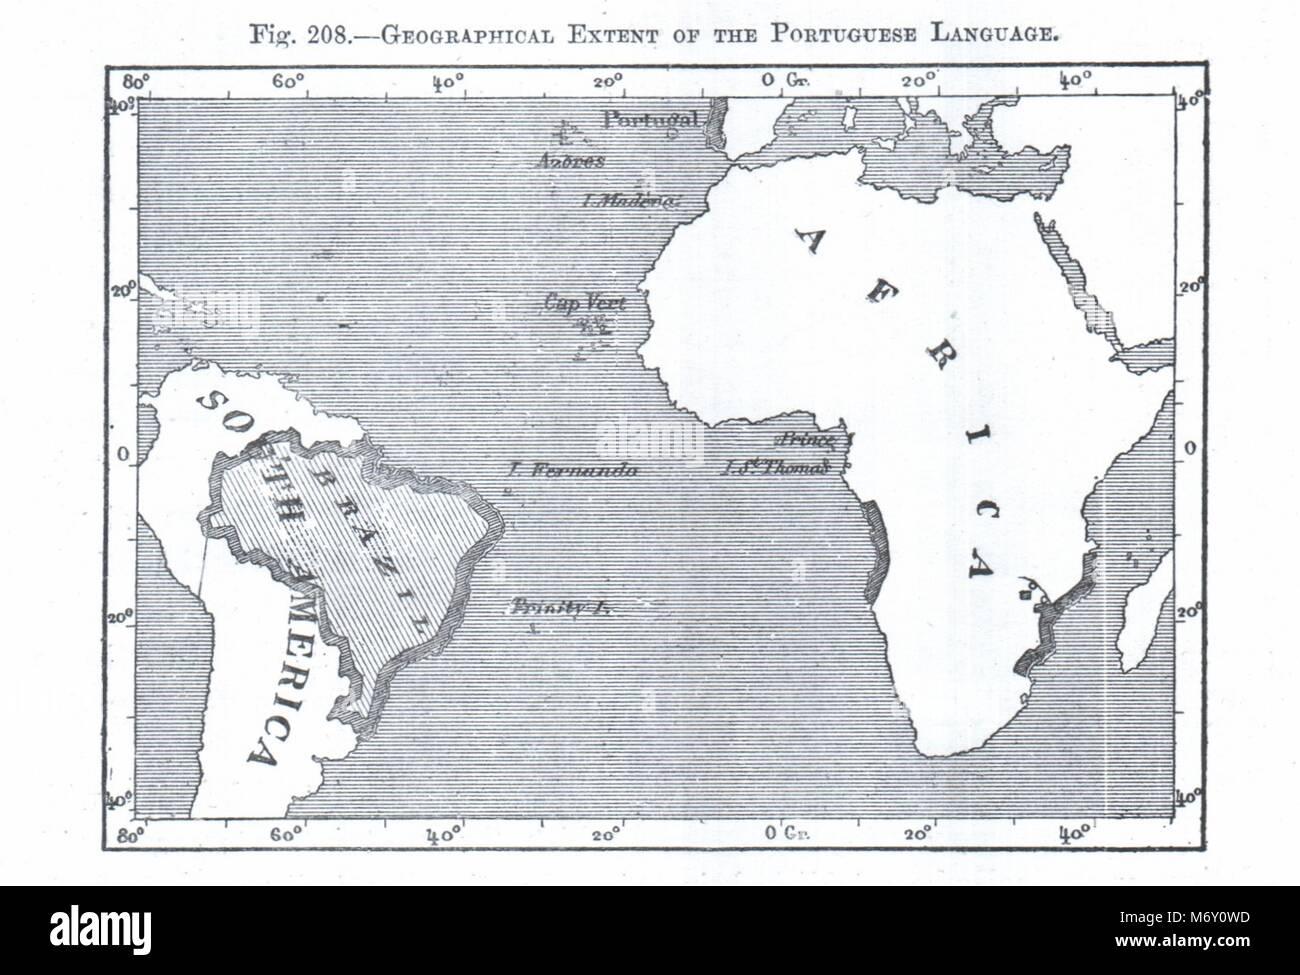 Extensión geográfica de la lengua portuguesa. Brasil África. Croquis 1885 Foto de stock